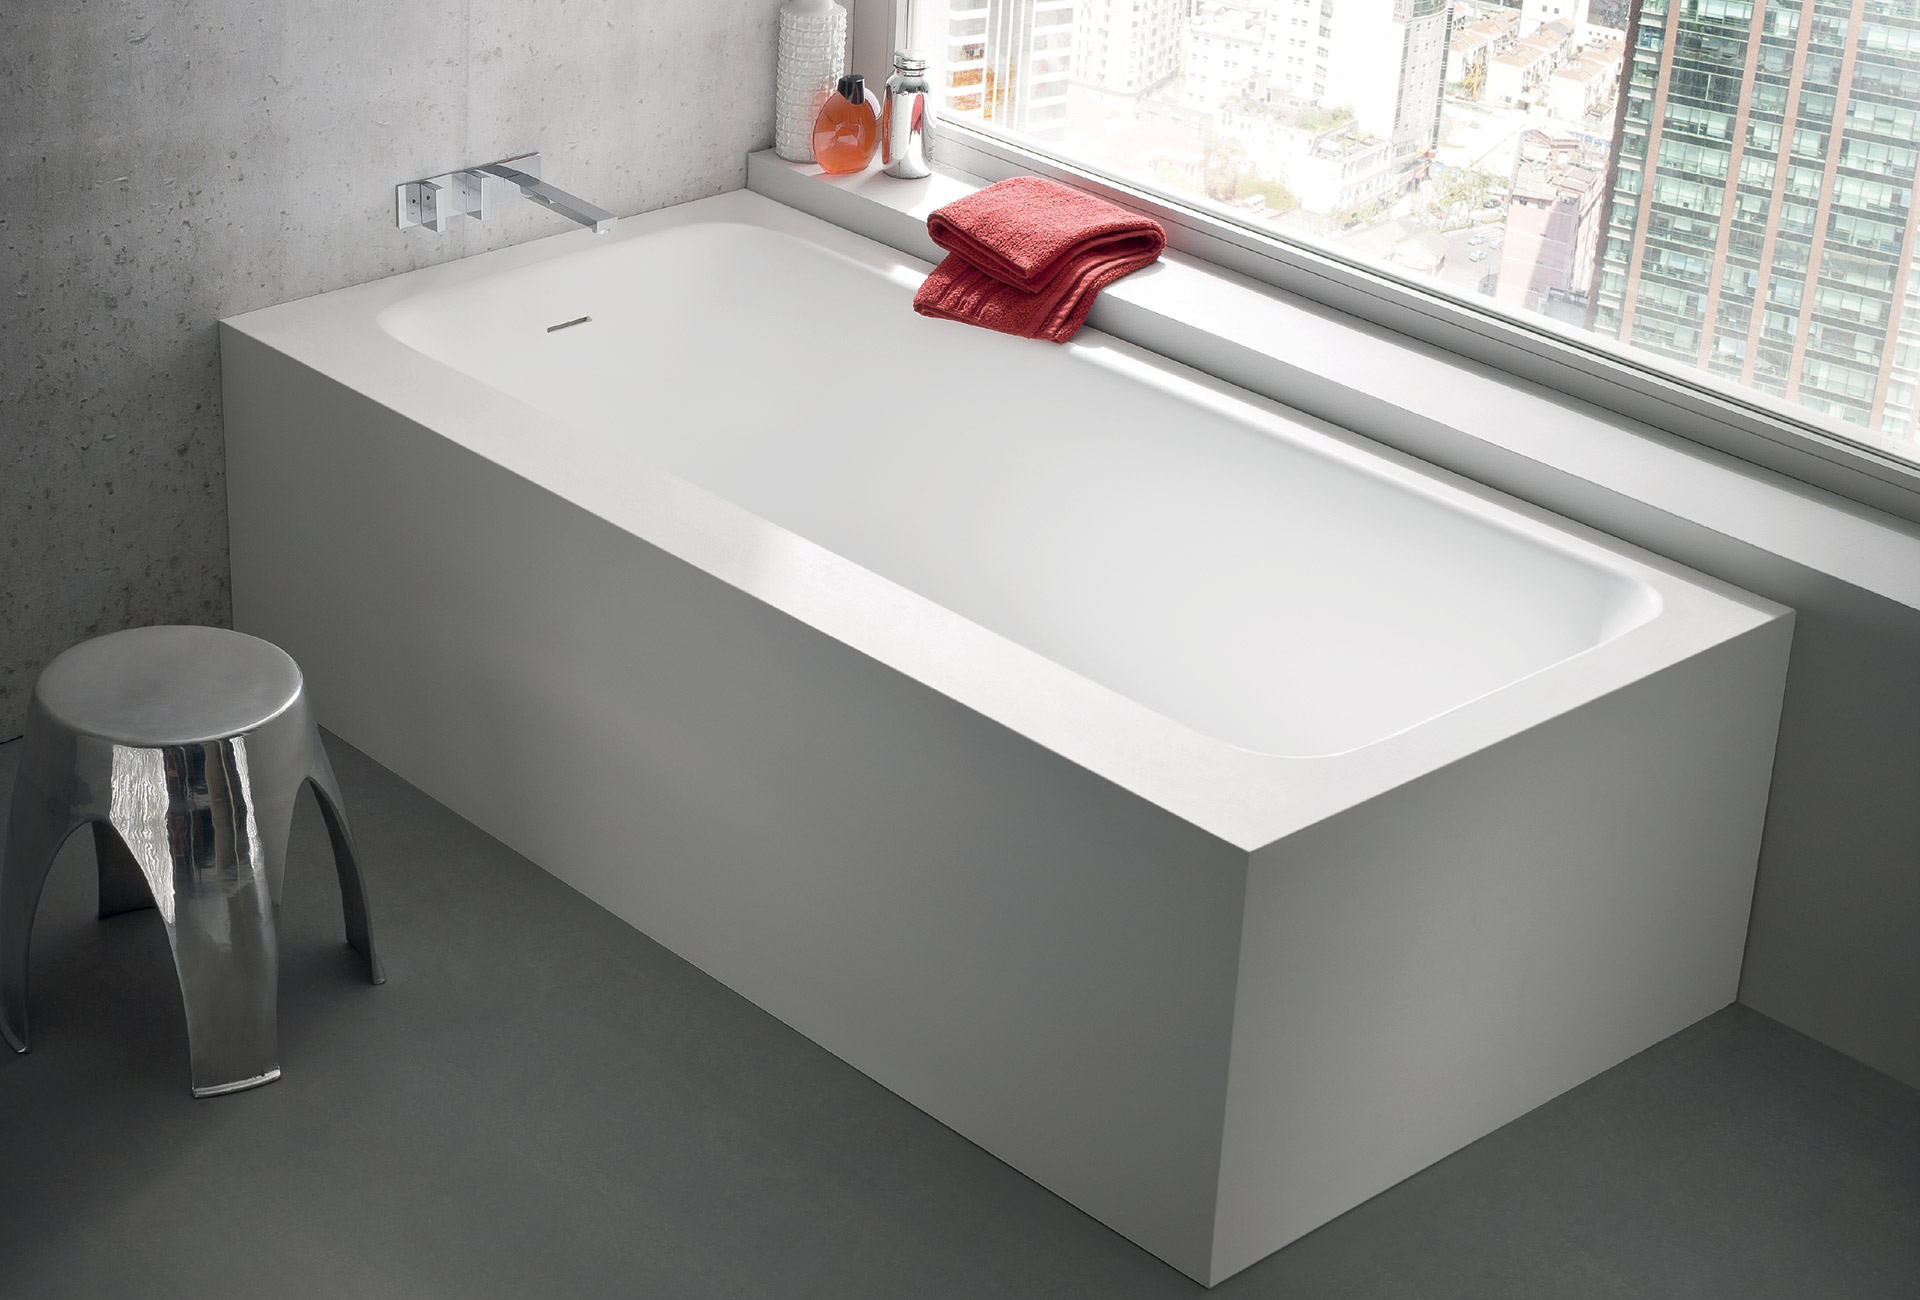 Vasca Da Bagno Incasso 170x70 : Vasche da bagno incasso dimensioni vasca ng sanitari le ideali